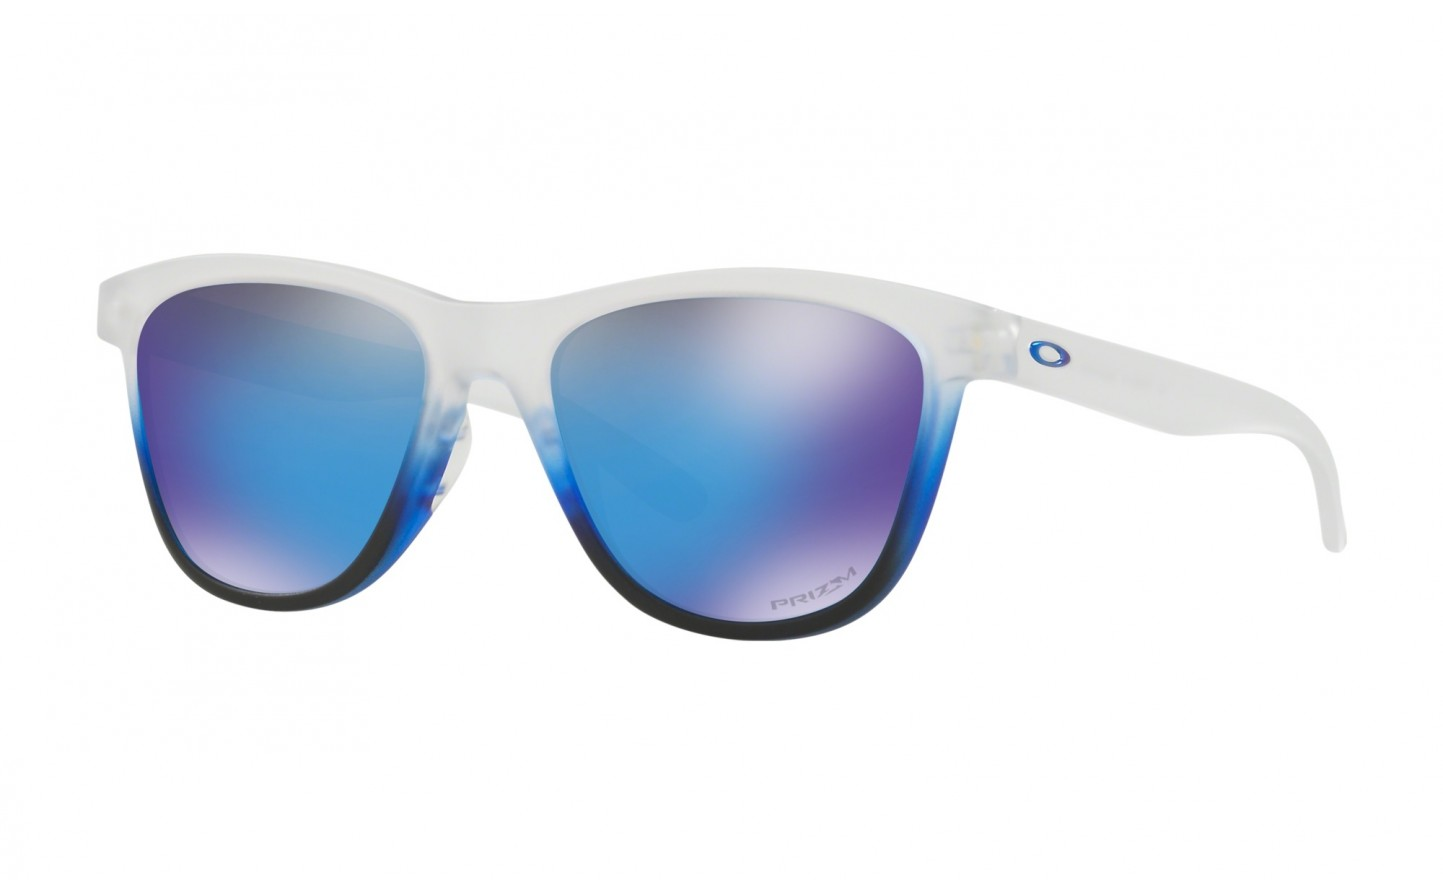 917b918194 Gafas Sol Oakley Moonlighter Sapphire Mist Lente Prizm Sapph |OO9320-1853|  ...